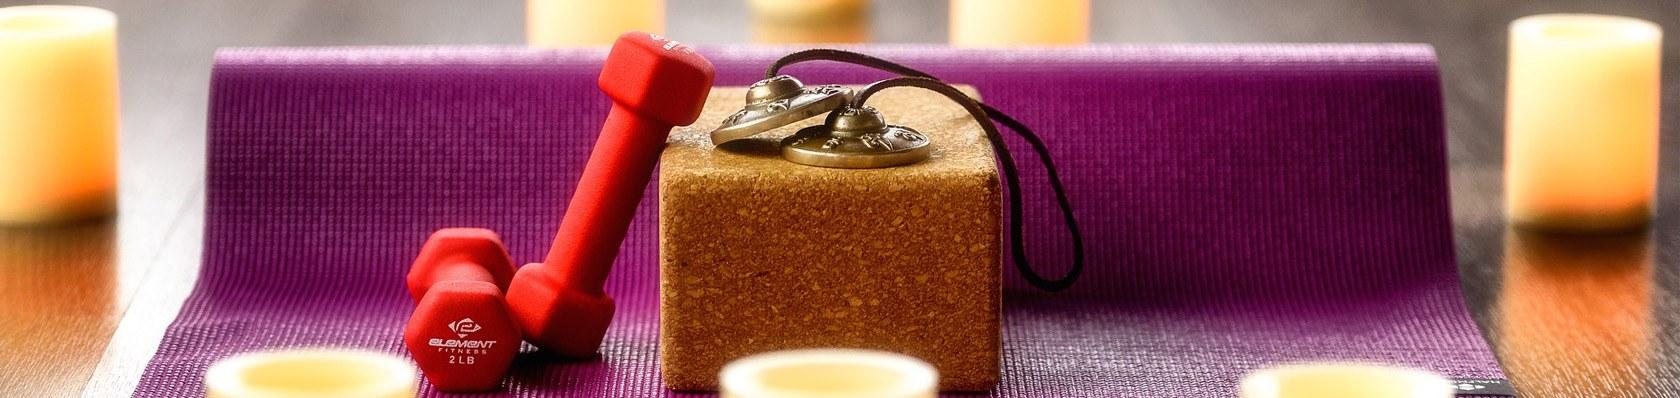 Yoga Shops im Test auf ExpertenTesten.de